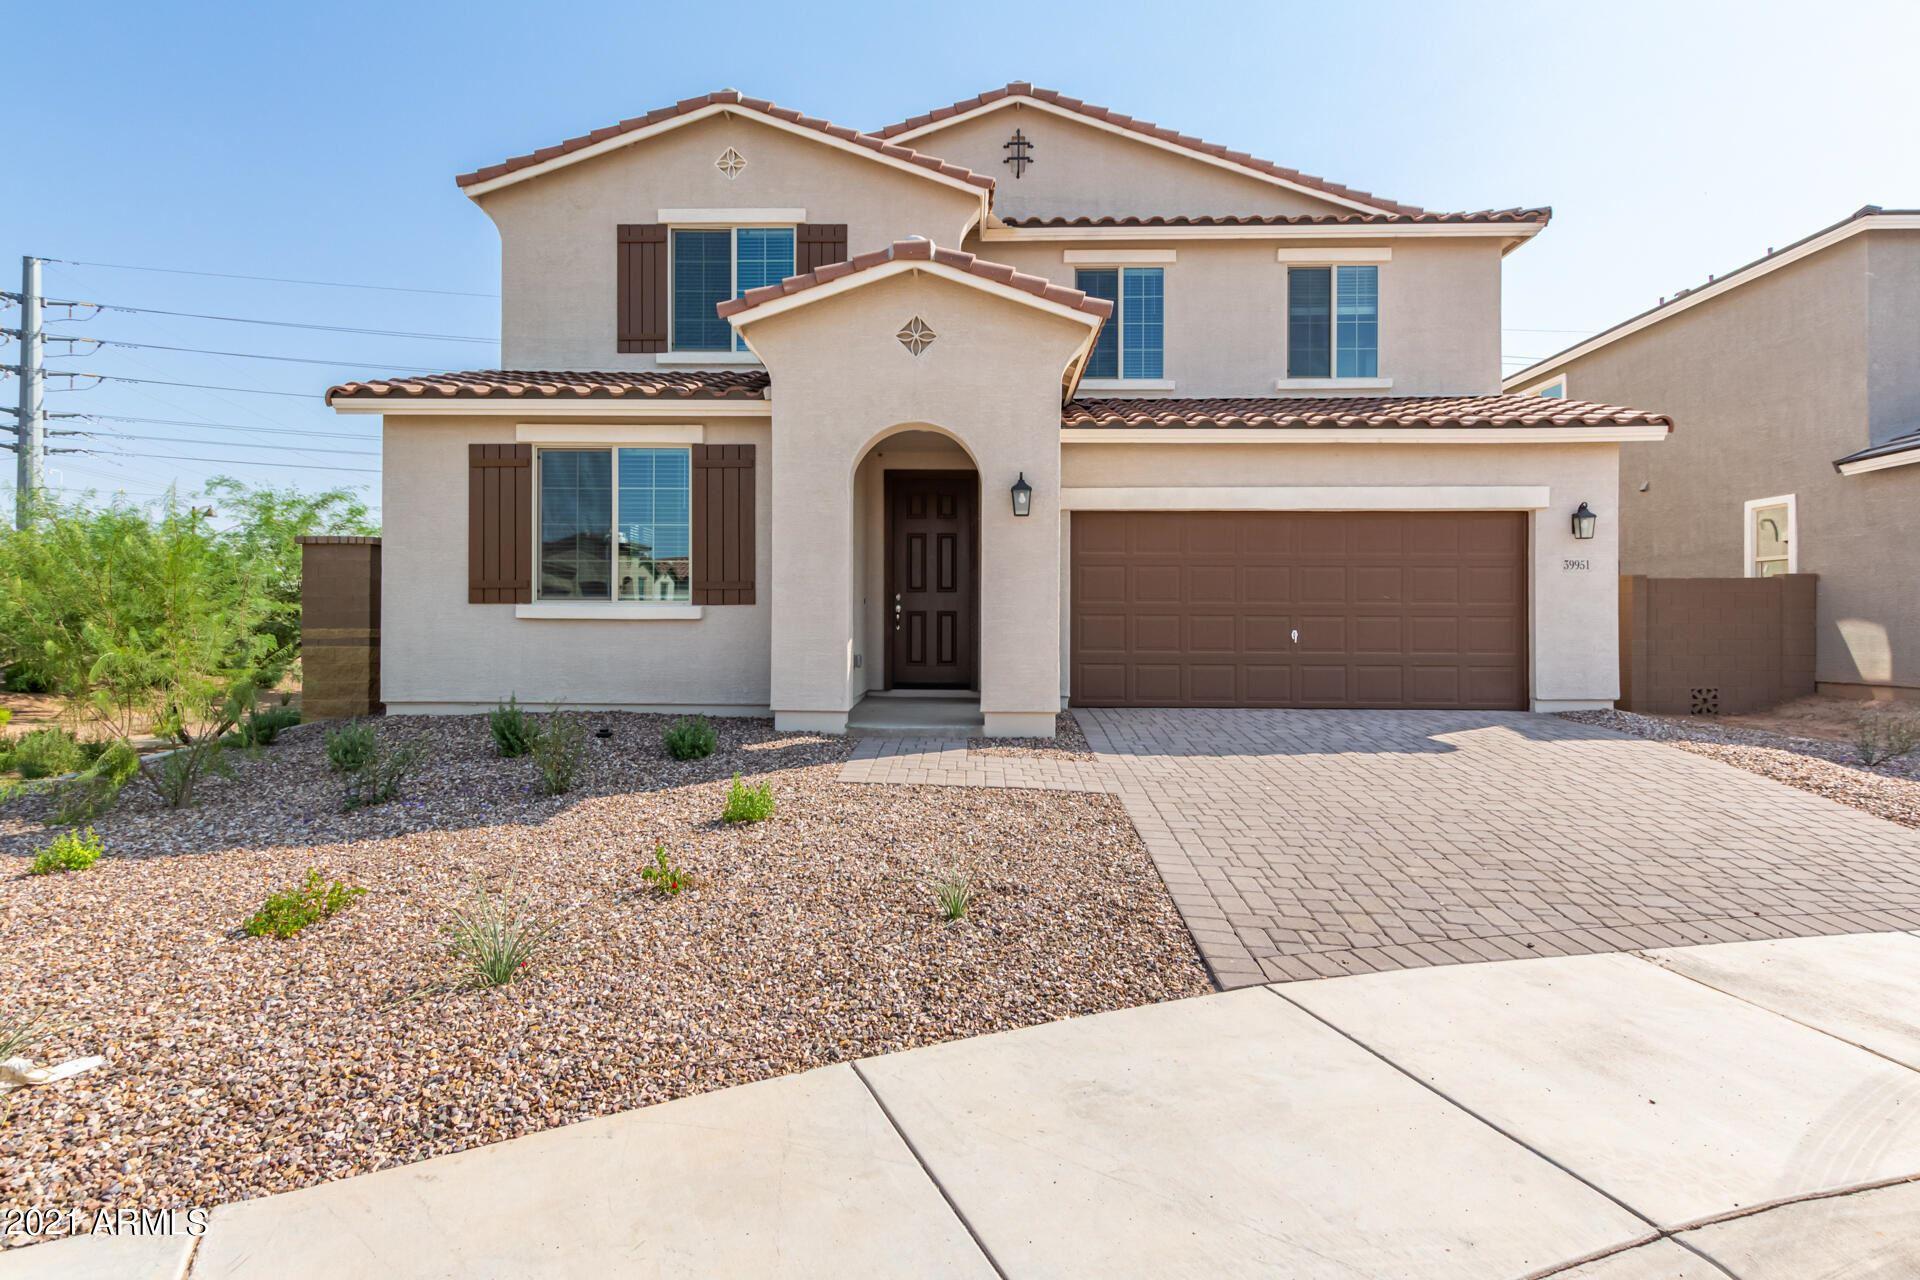 Photo for 39951 W HENSLEY Way, Maricopa, AZ 85138 (MLS # 6272677)